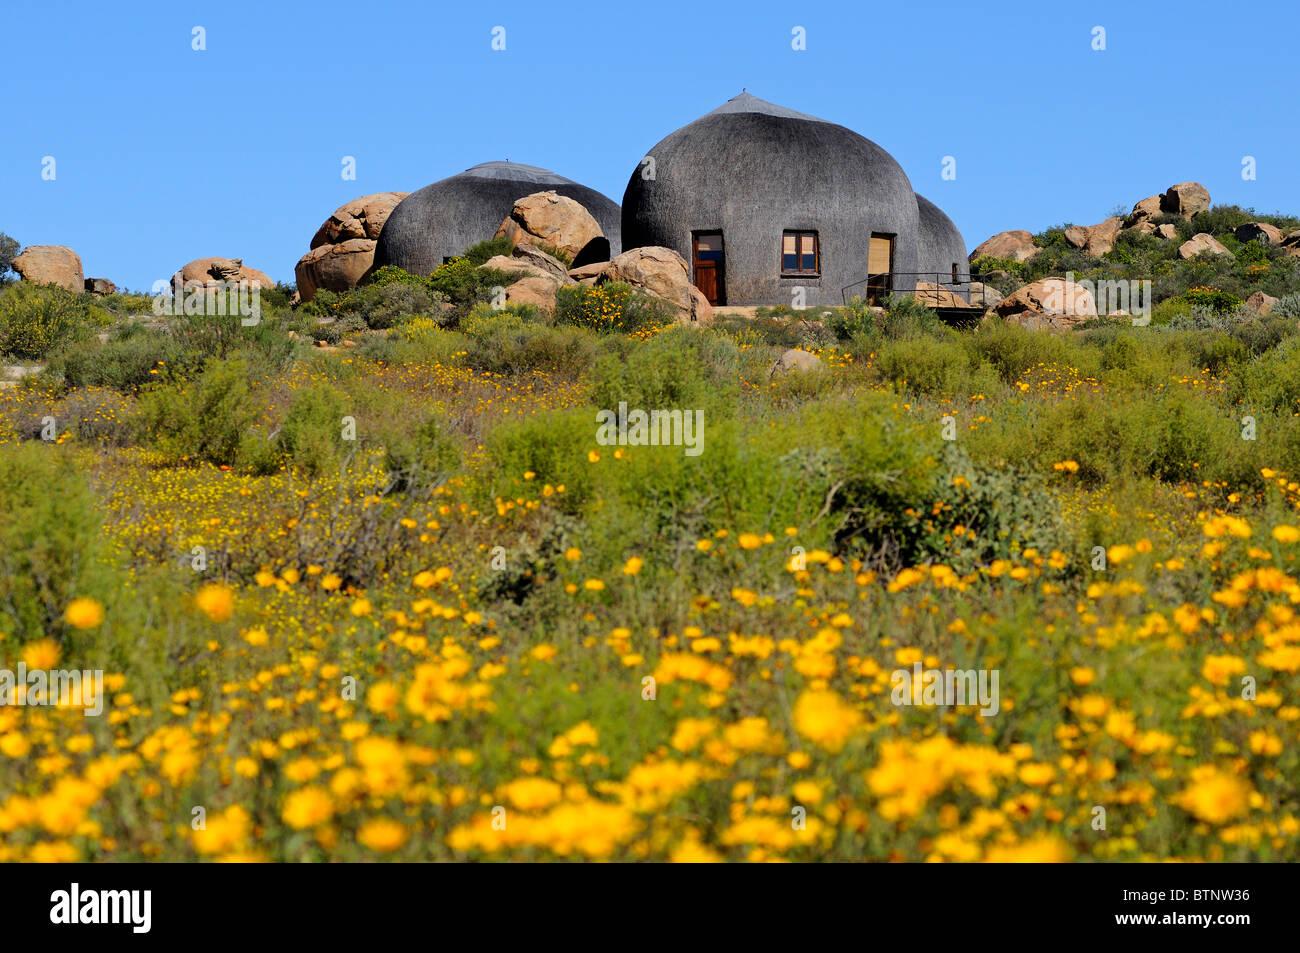 Namakwa Mountain Suite, Naries Namakwa Retreat, Naries, South Africa - Stock Image